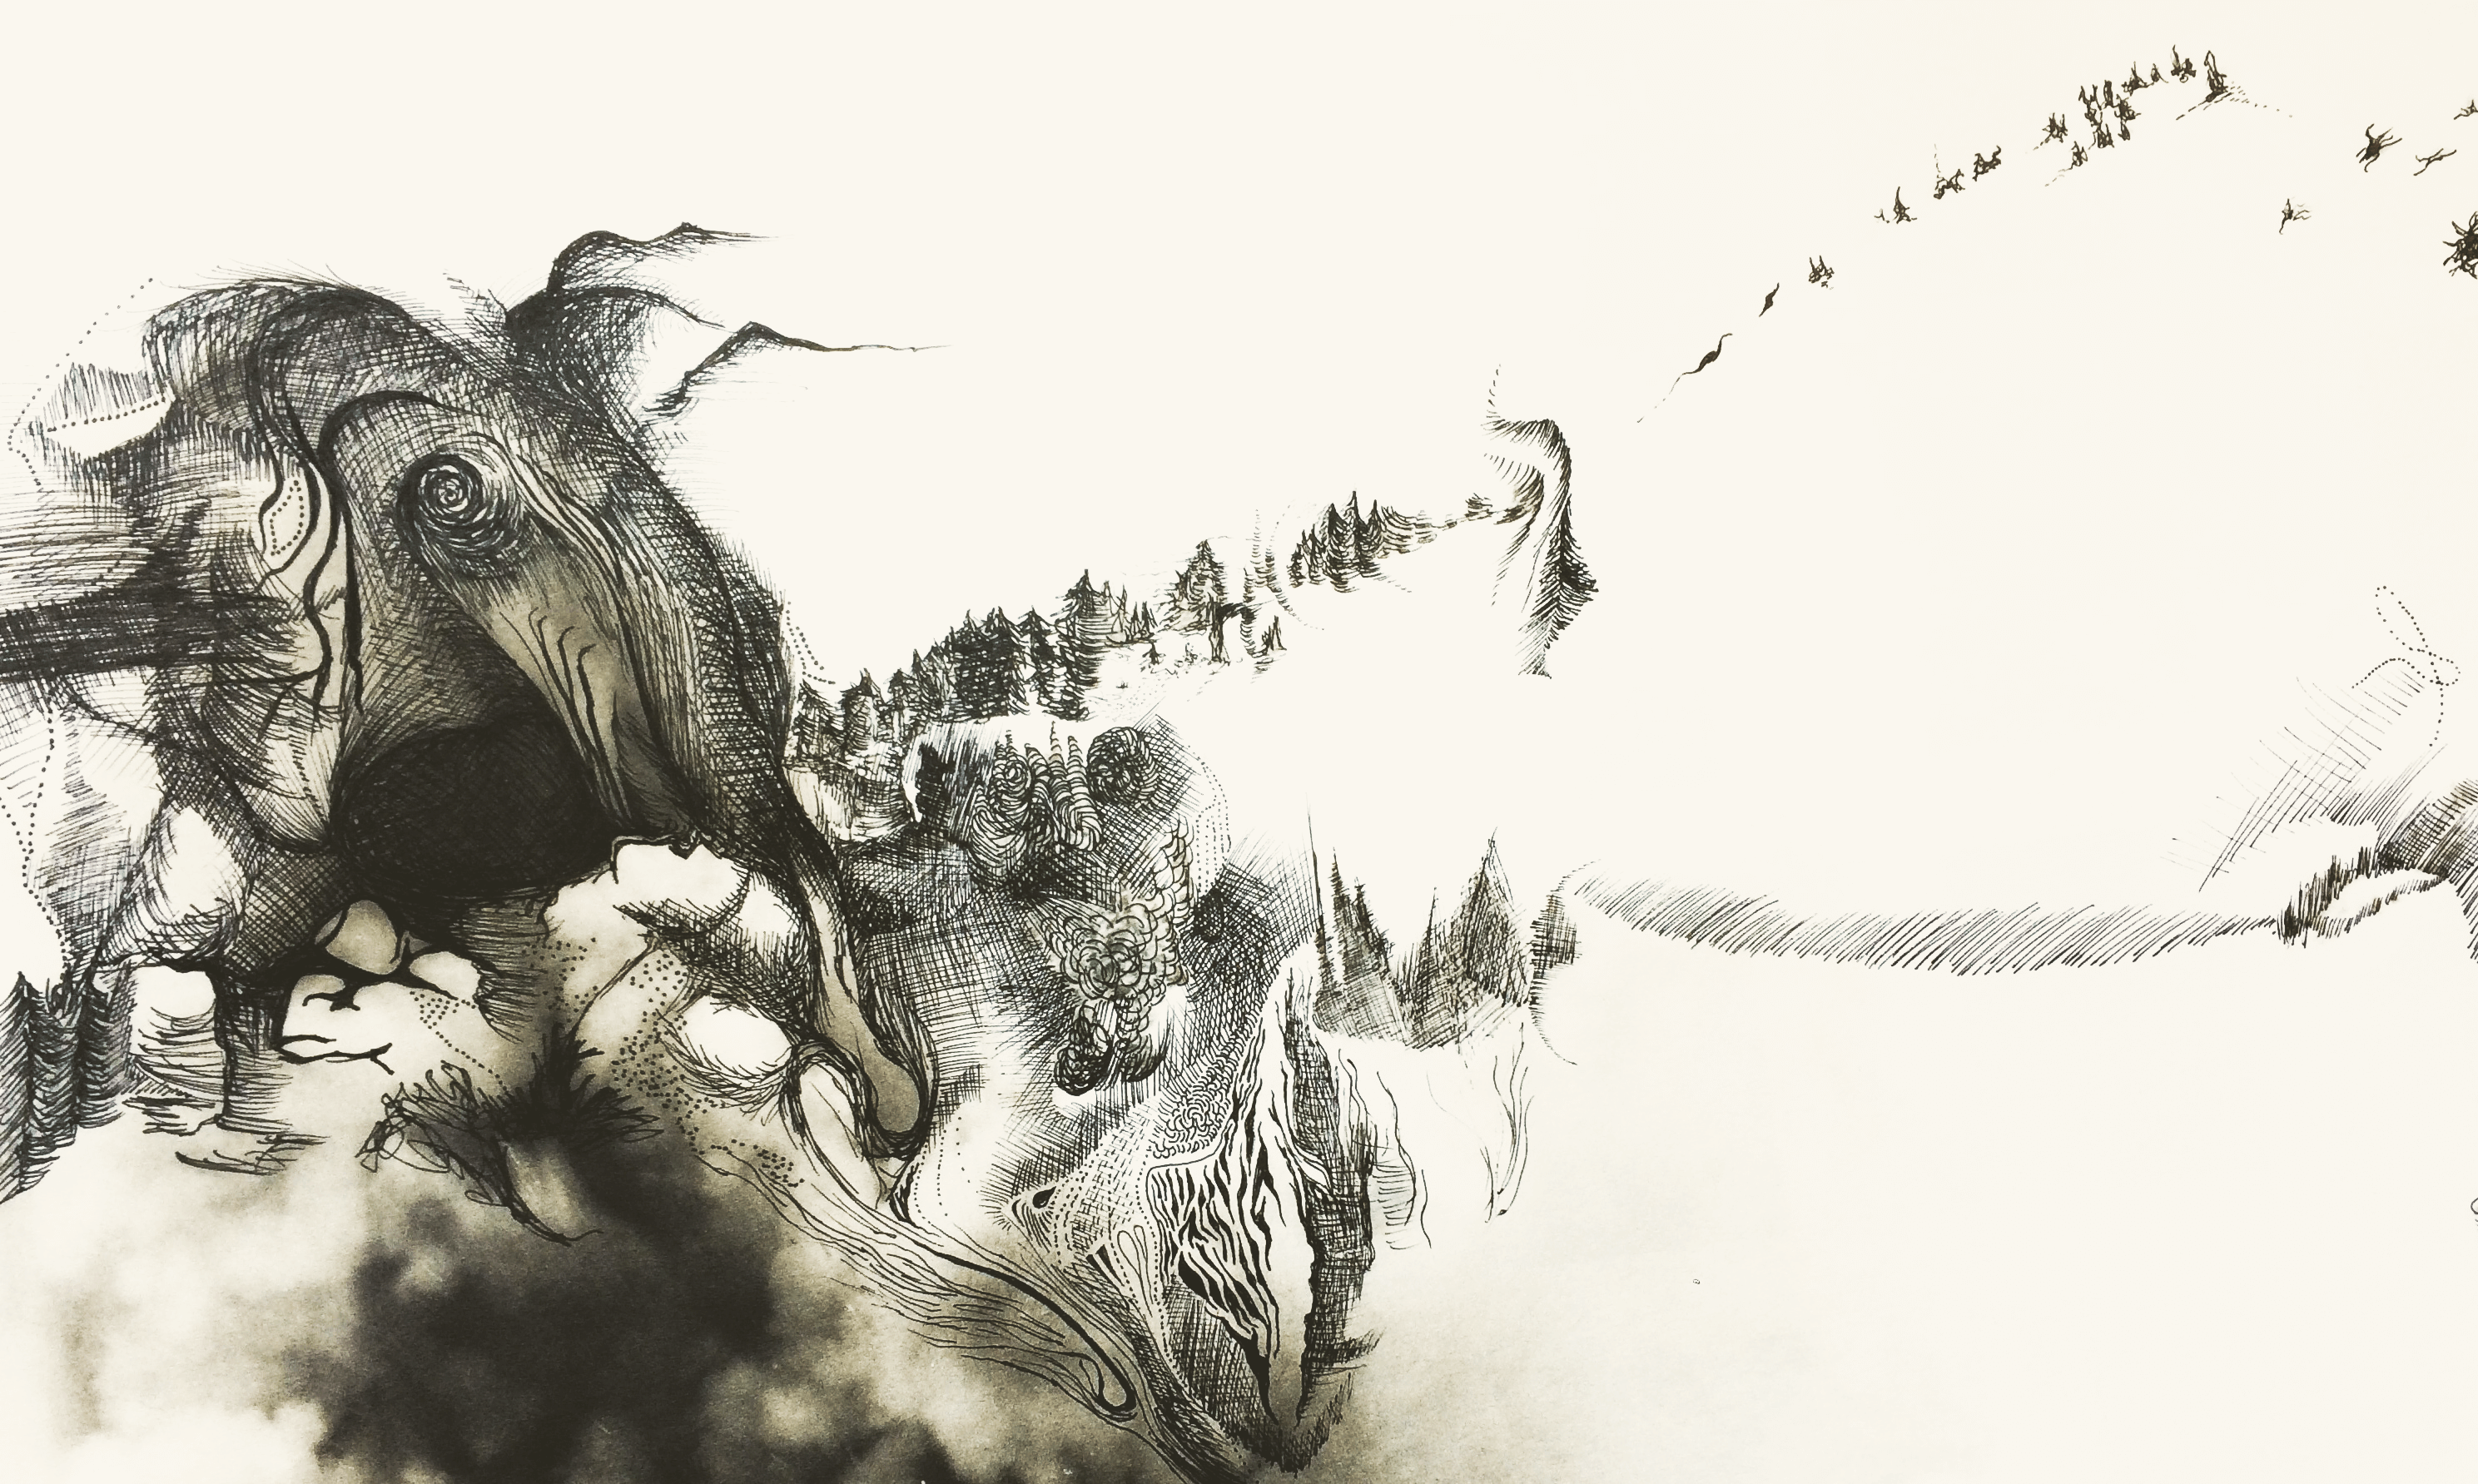 Snow elephant artwork